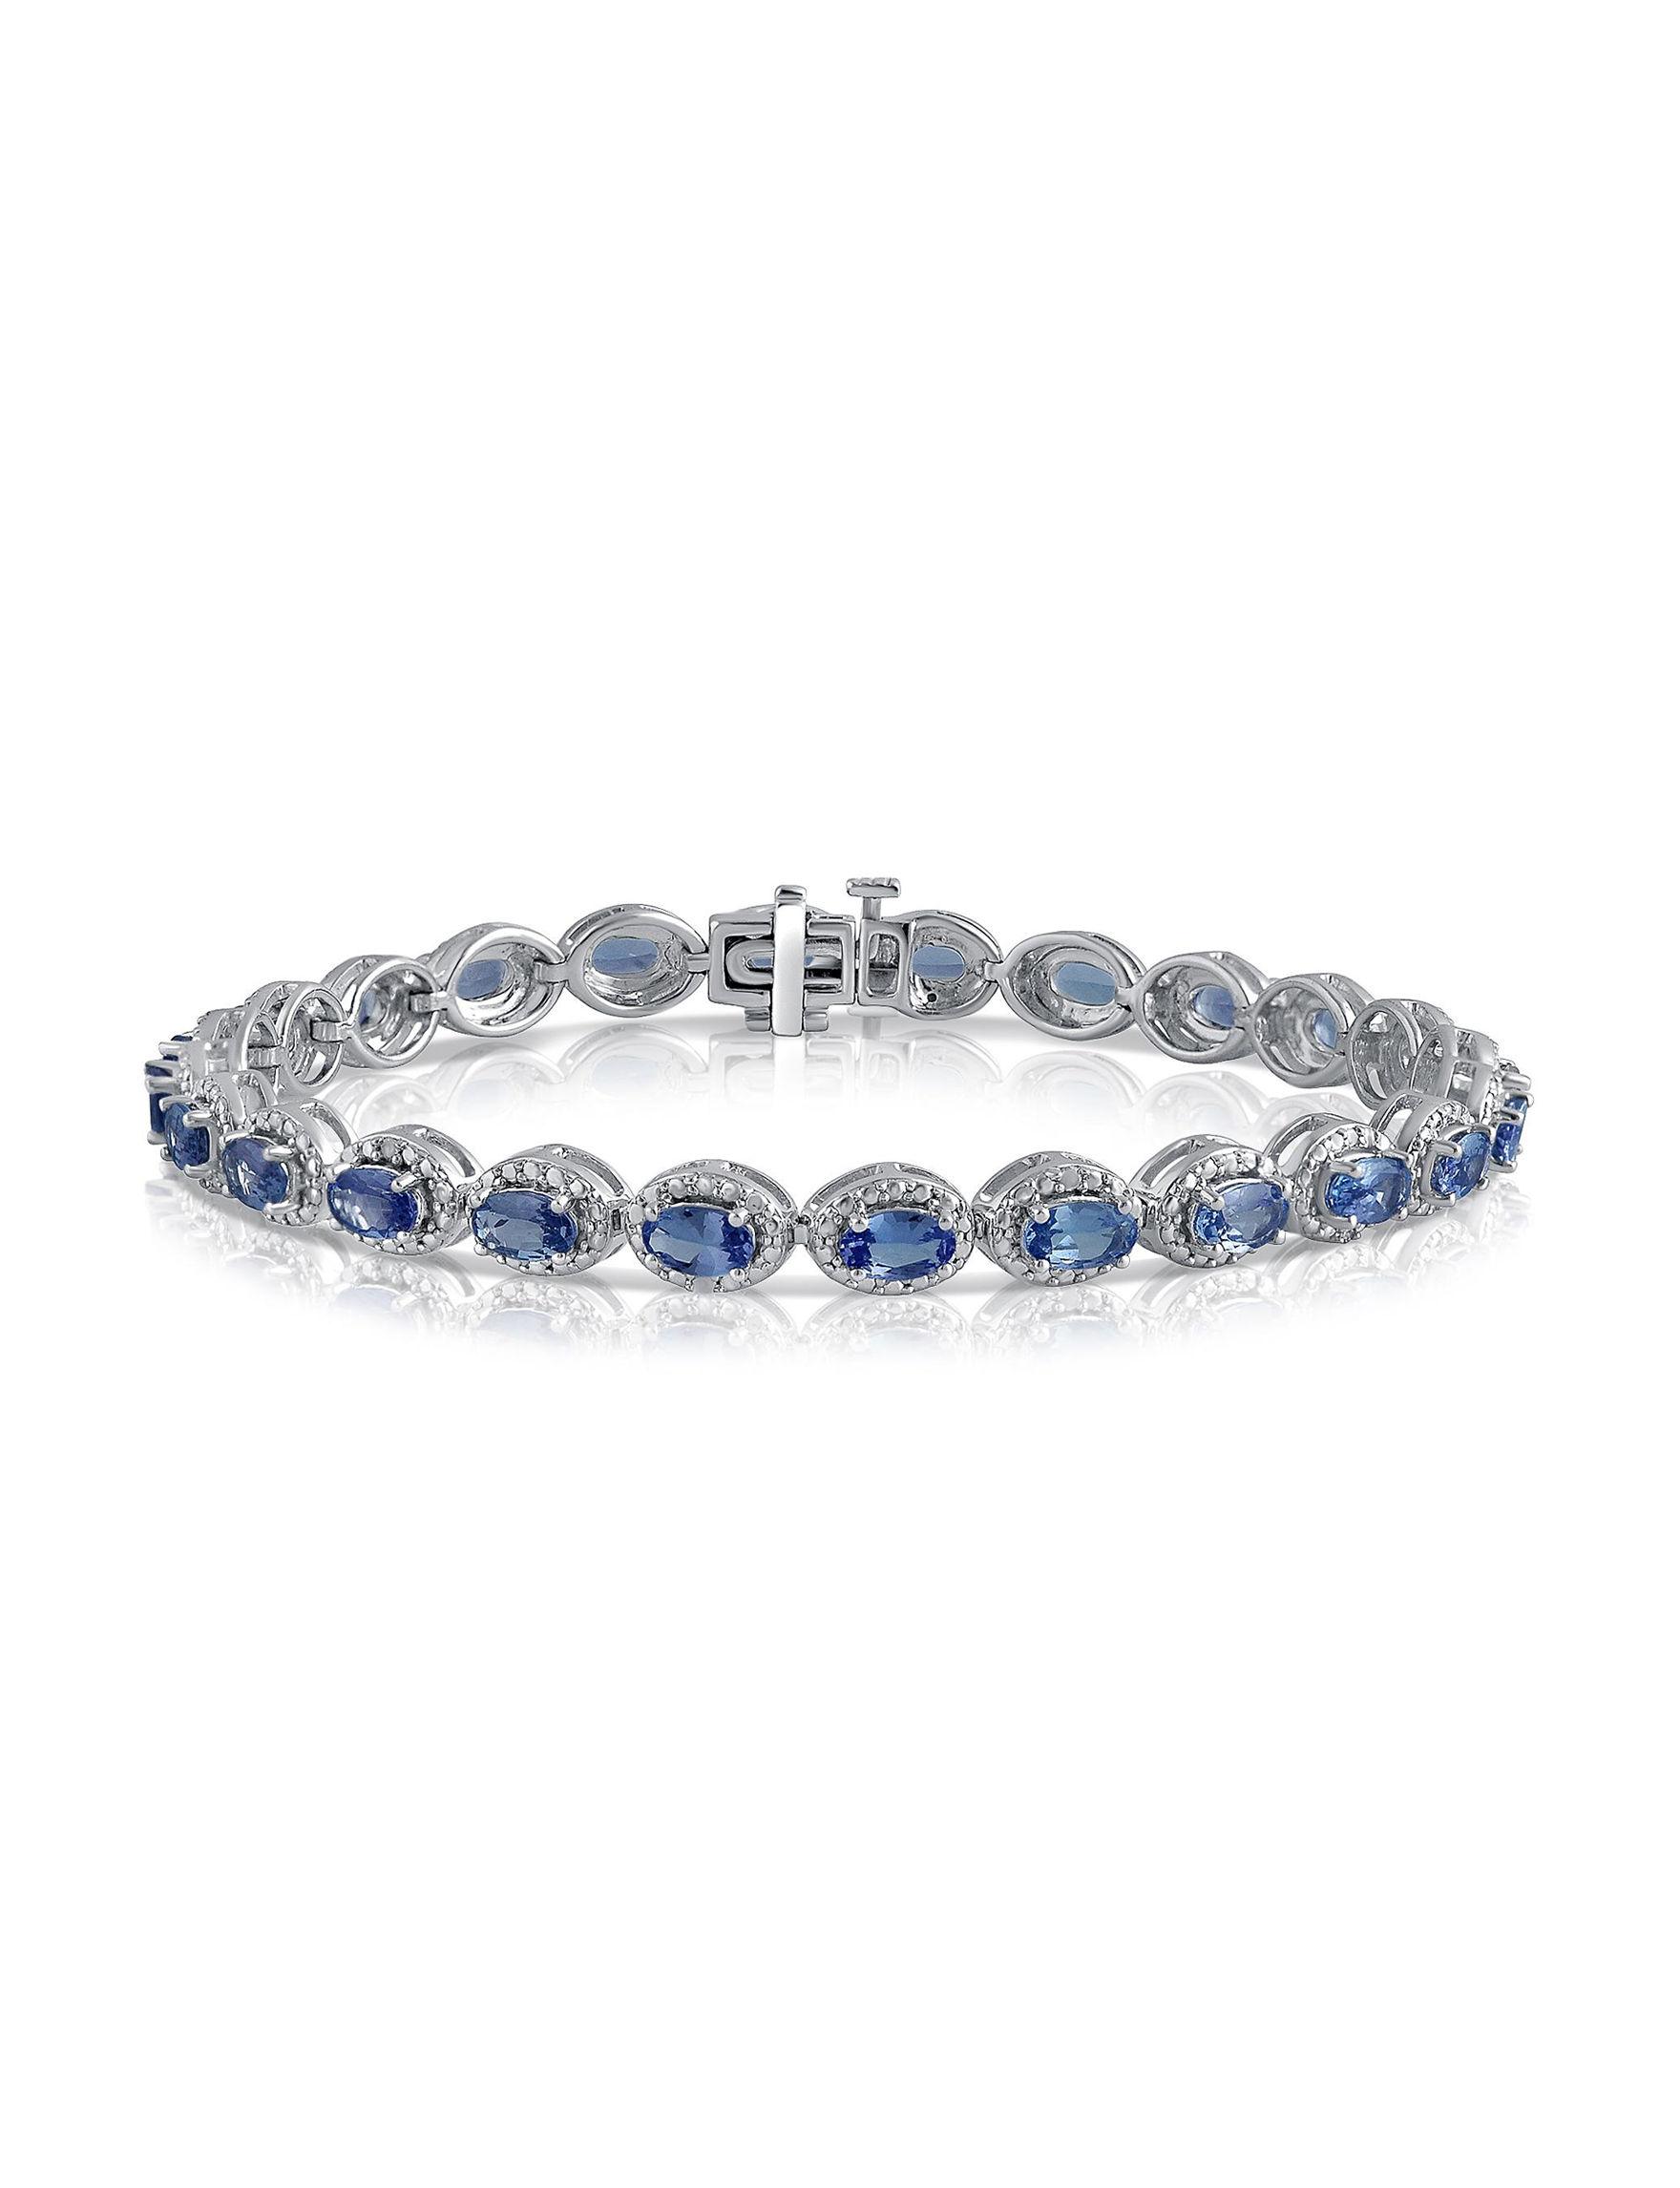 Kiran Gold Bracelets Fine Jewelry